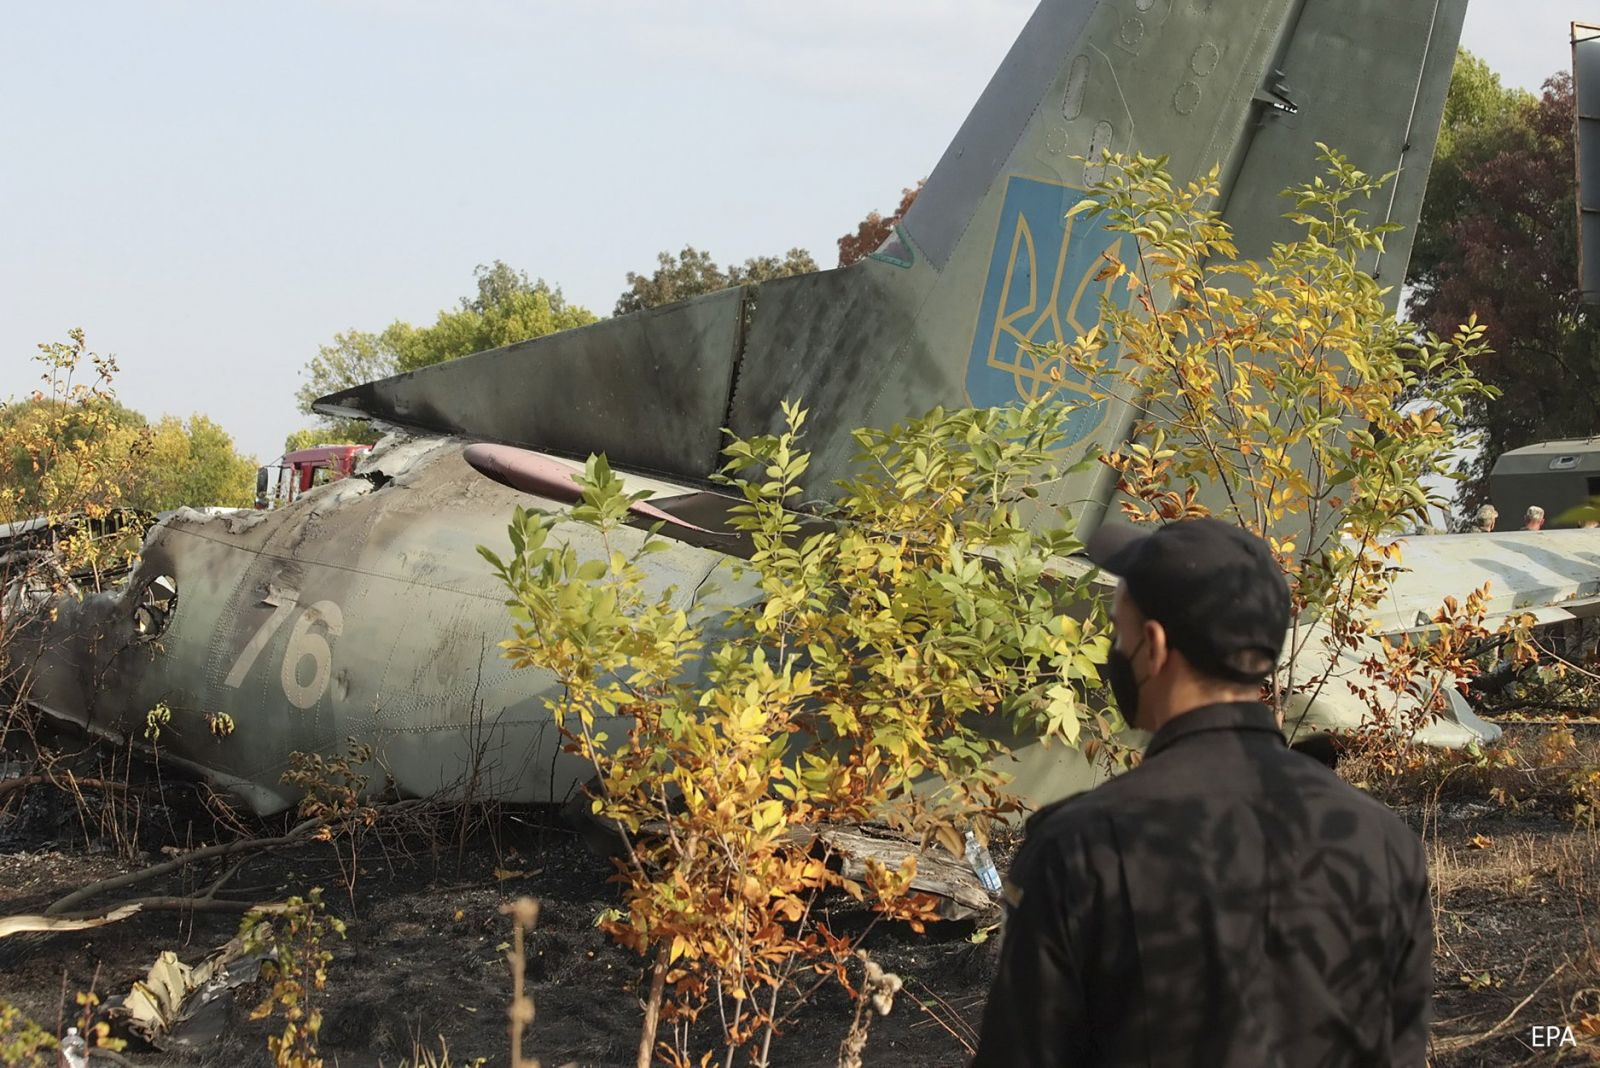 Авиакатастрофа на учениях: все, что известно о крушении самолета под Хар...